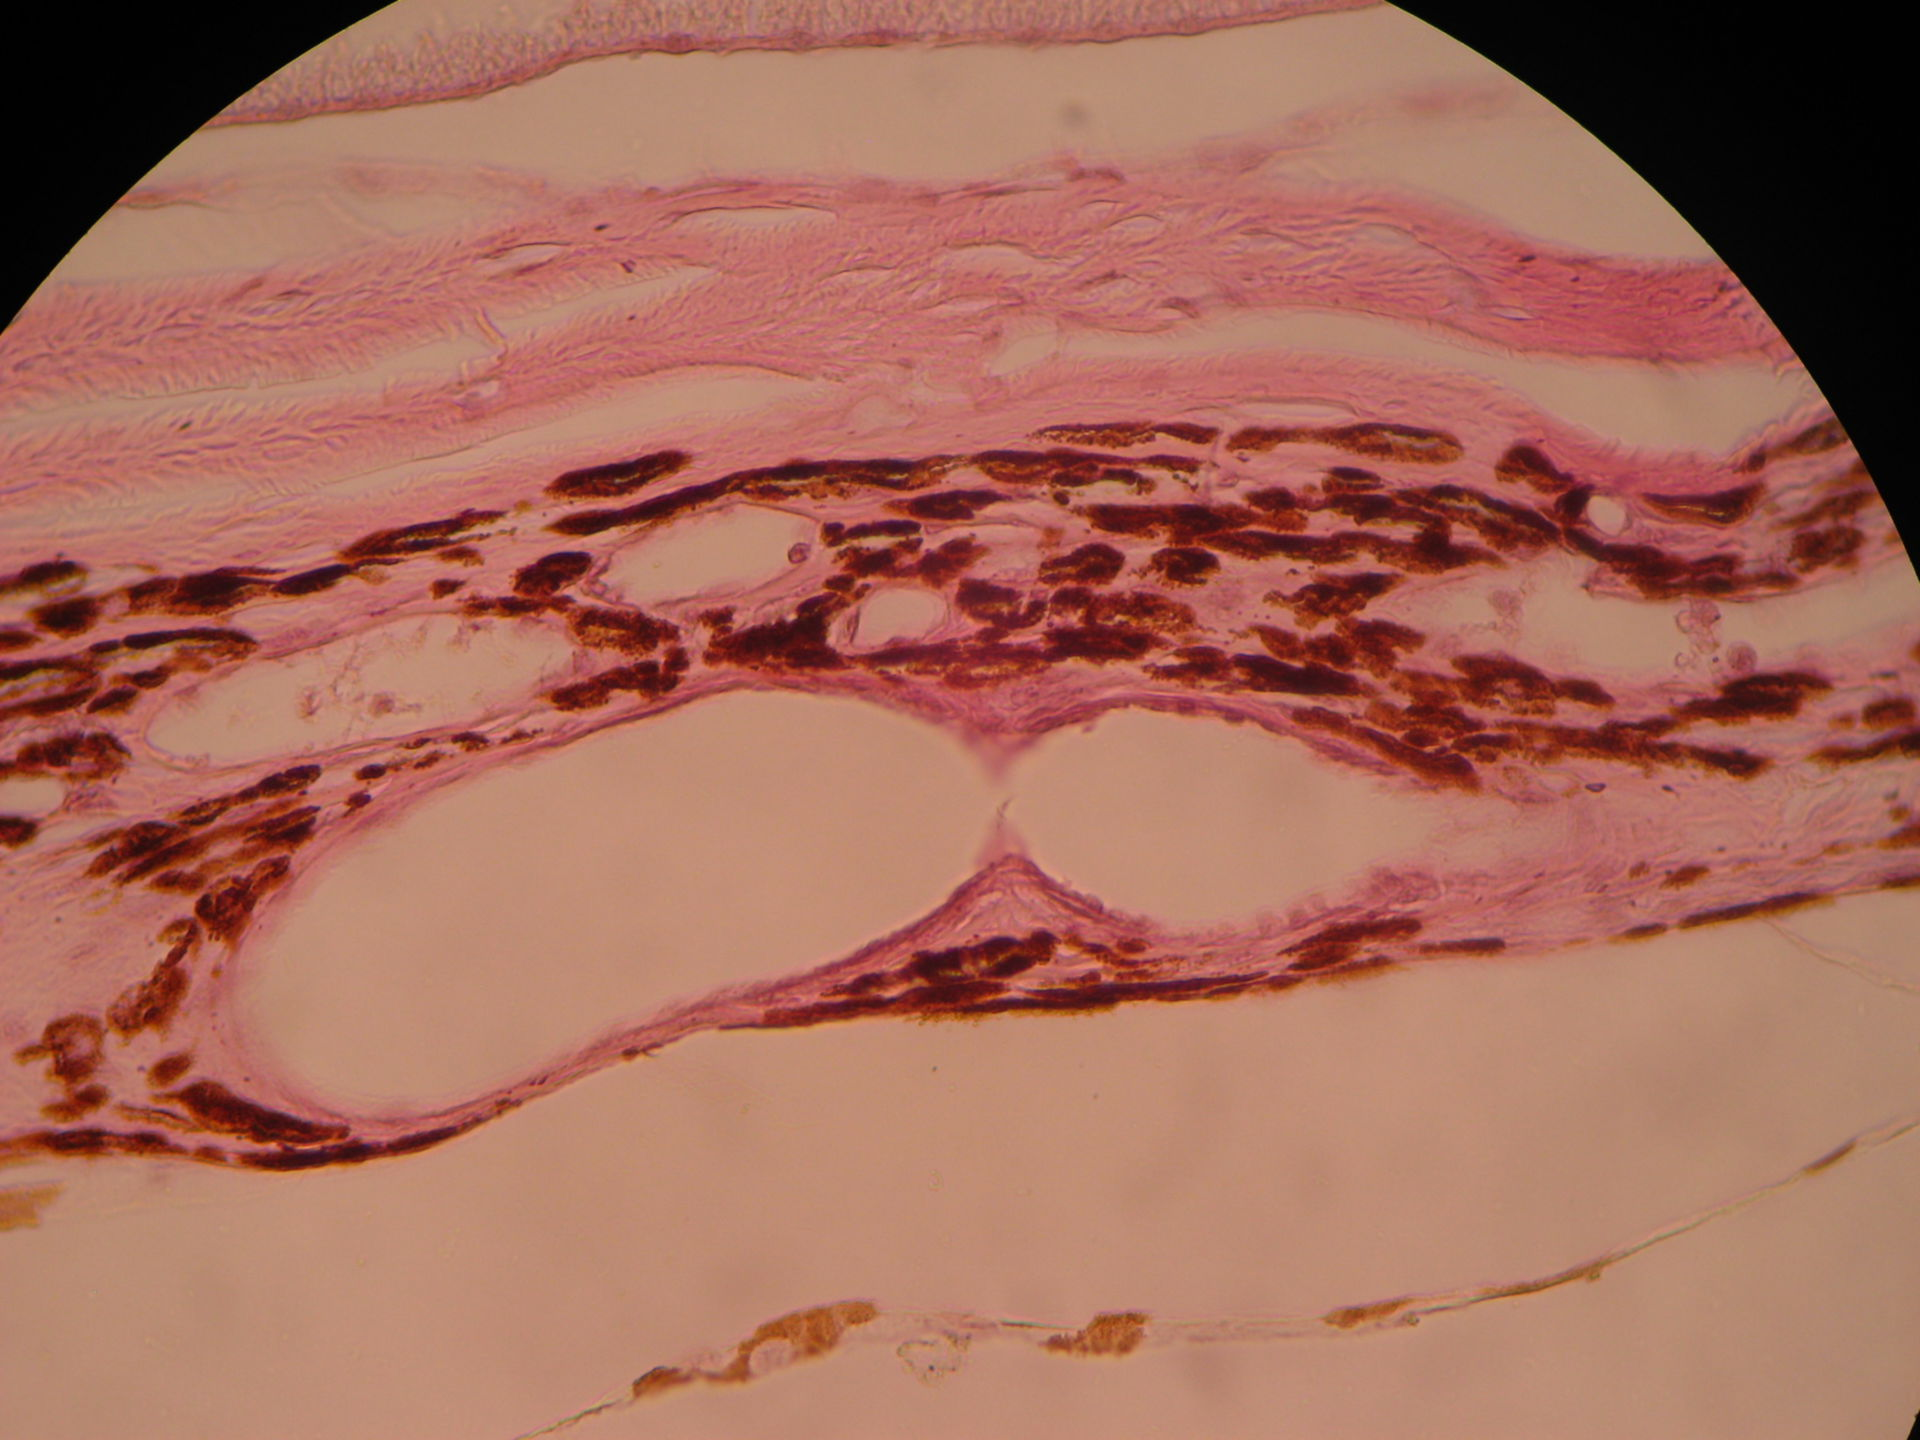 Auge des Schafes - Lamina vasculosa